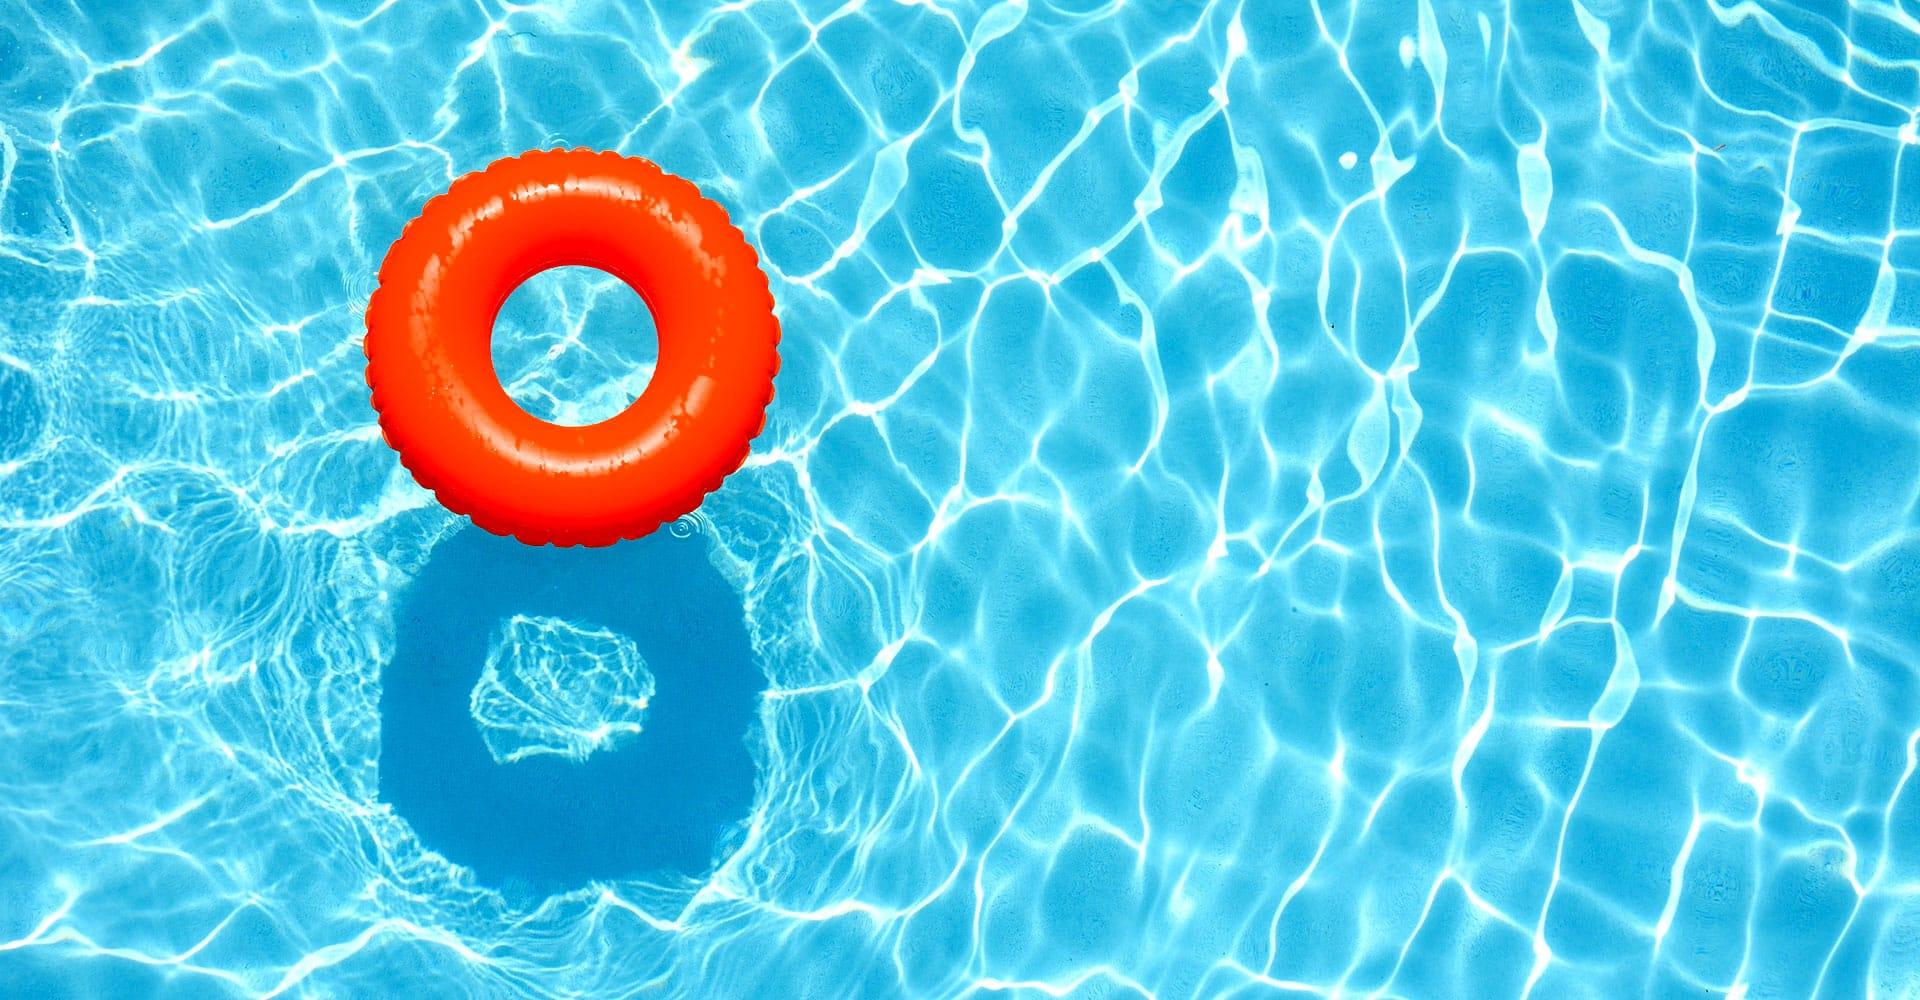 garda-calor-assistenza-caldaie-trattamento-delle-acque